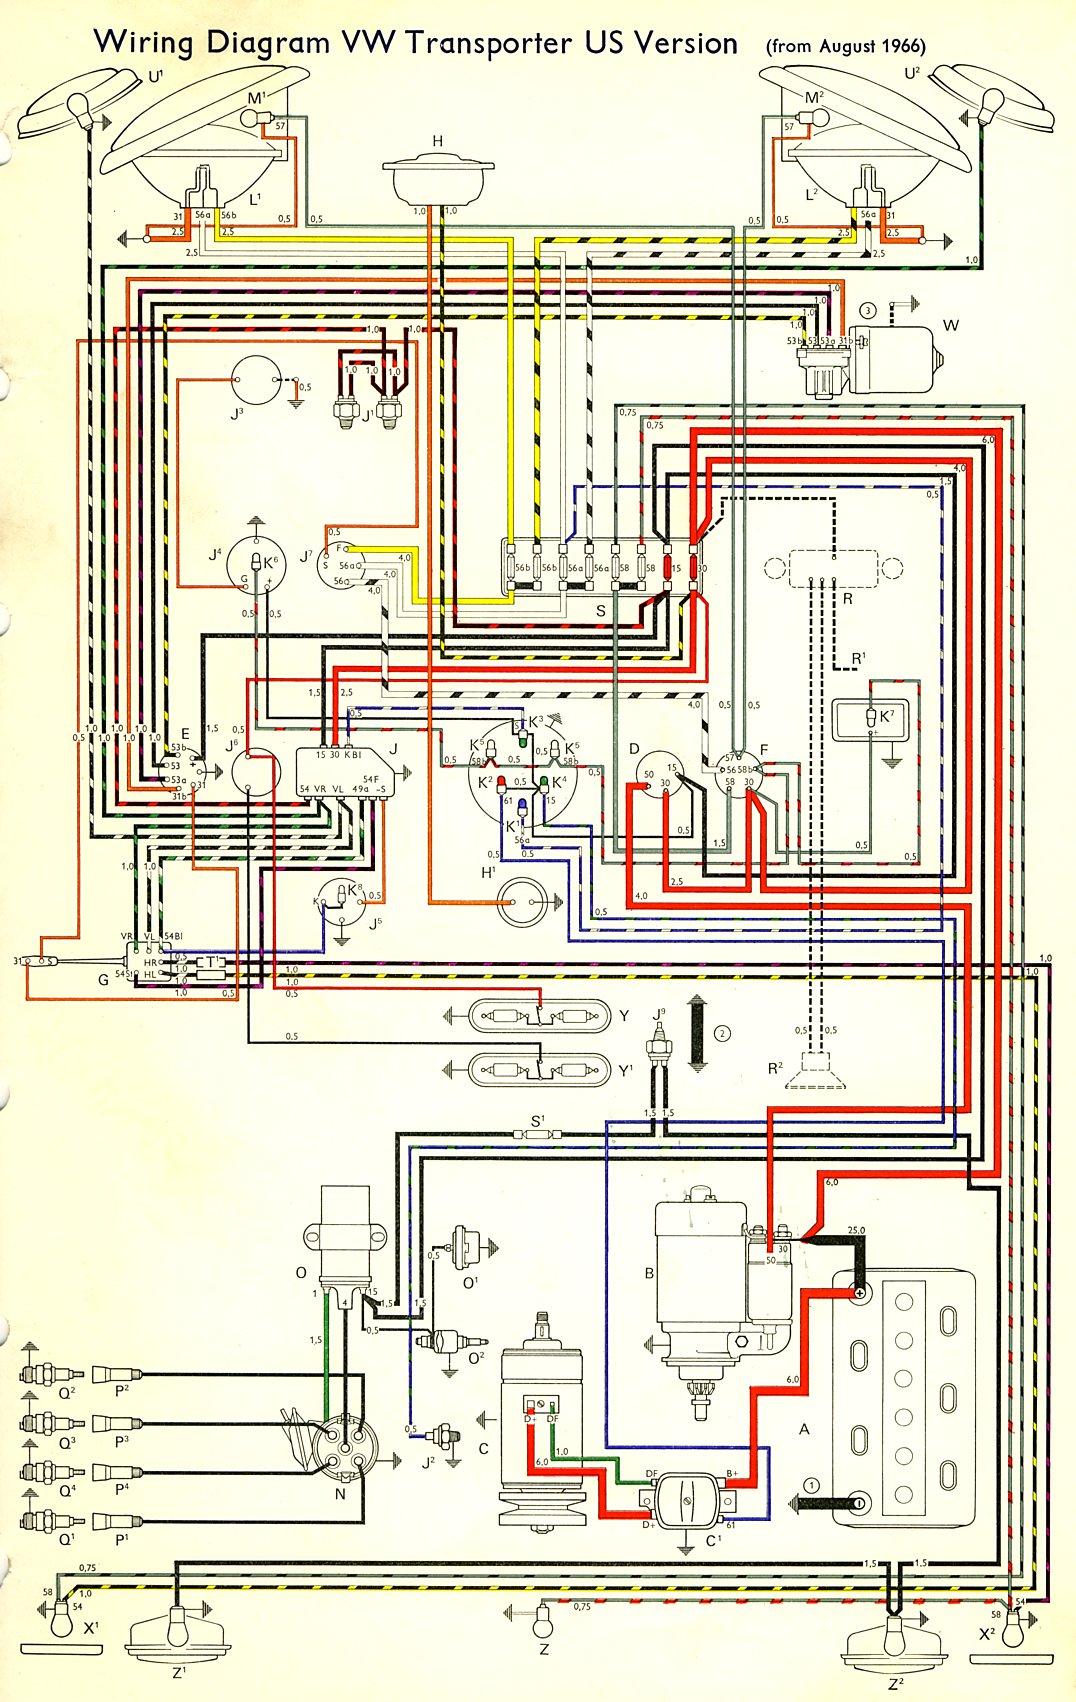 vw transporter wiring diagram t4 samsung electric dryer 1967 bus usa thegoldenbug